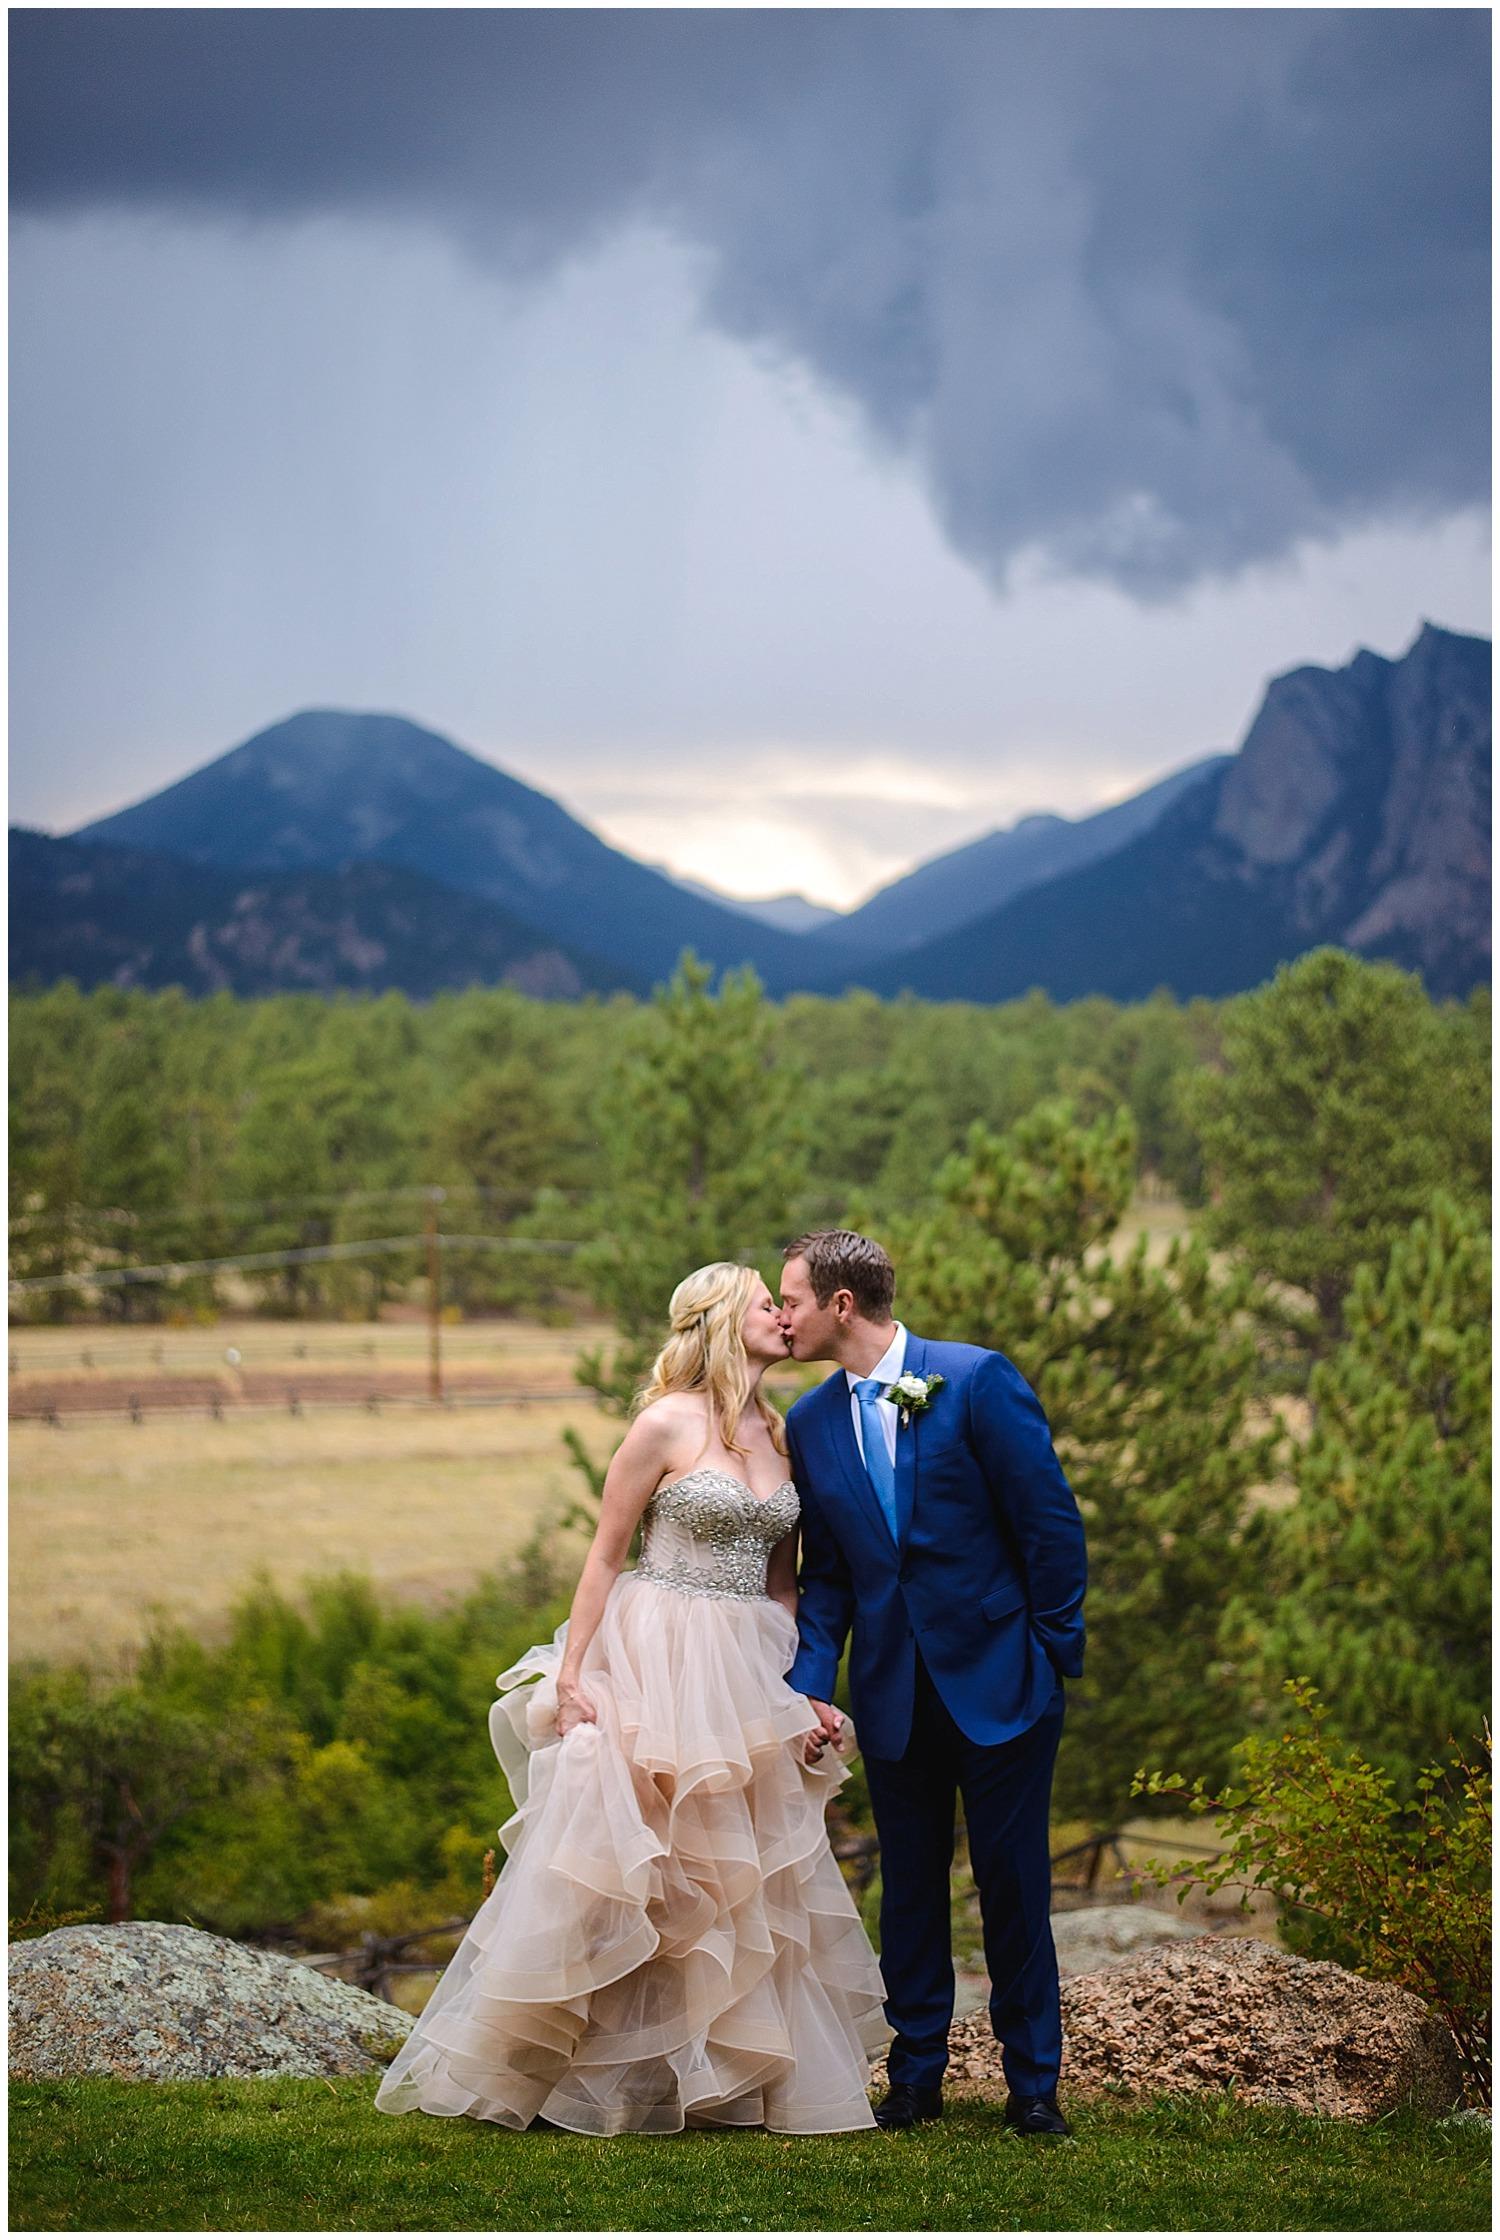 Estes-Park-Black-Canyon-Inn-Wedding-photography-_0063.jpg